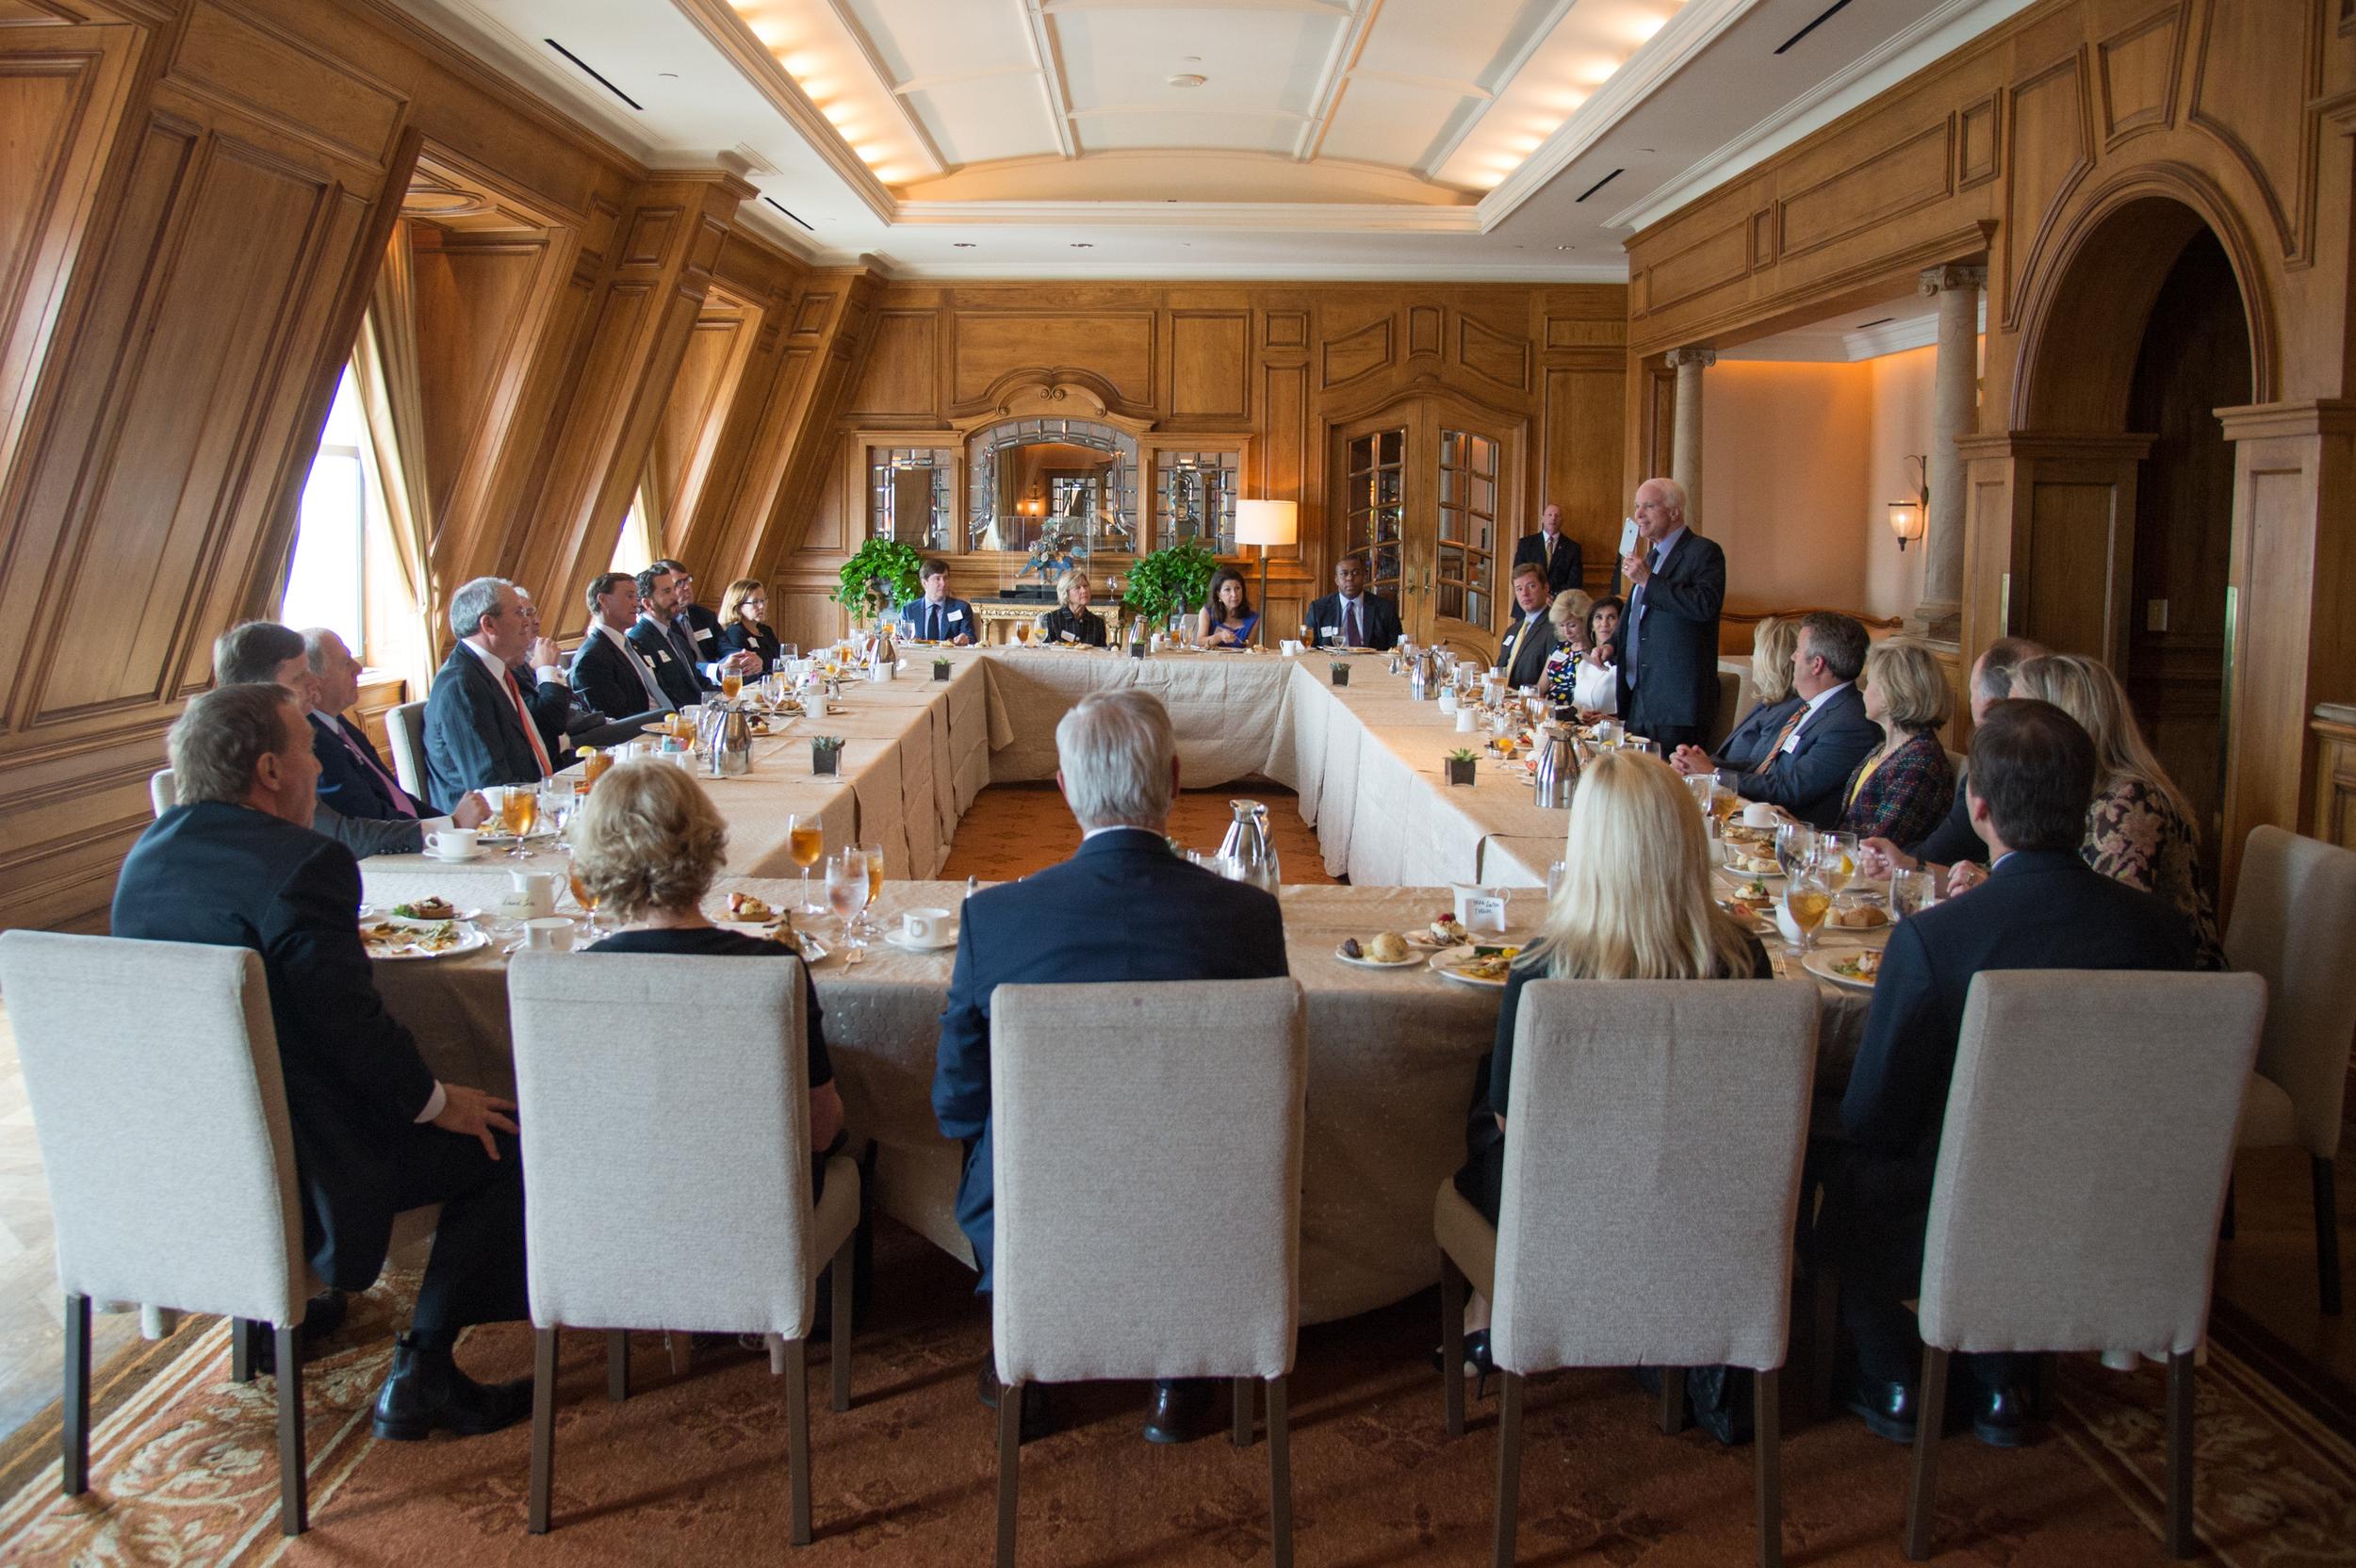 Senator John McCain (R-AZ) addresses and updates attendees at a Dallas luncheon in June, 2016.